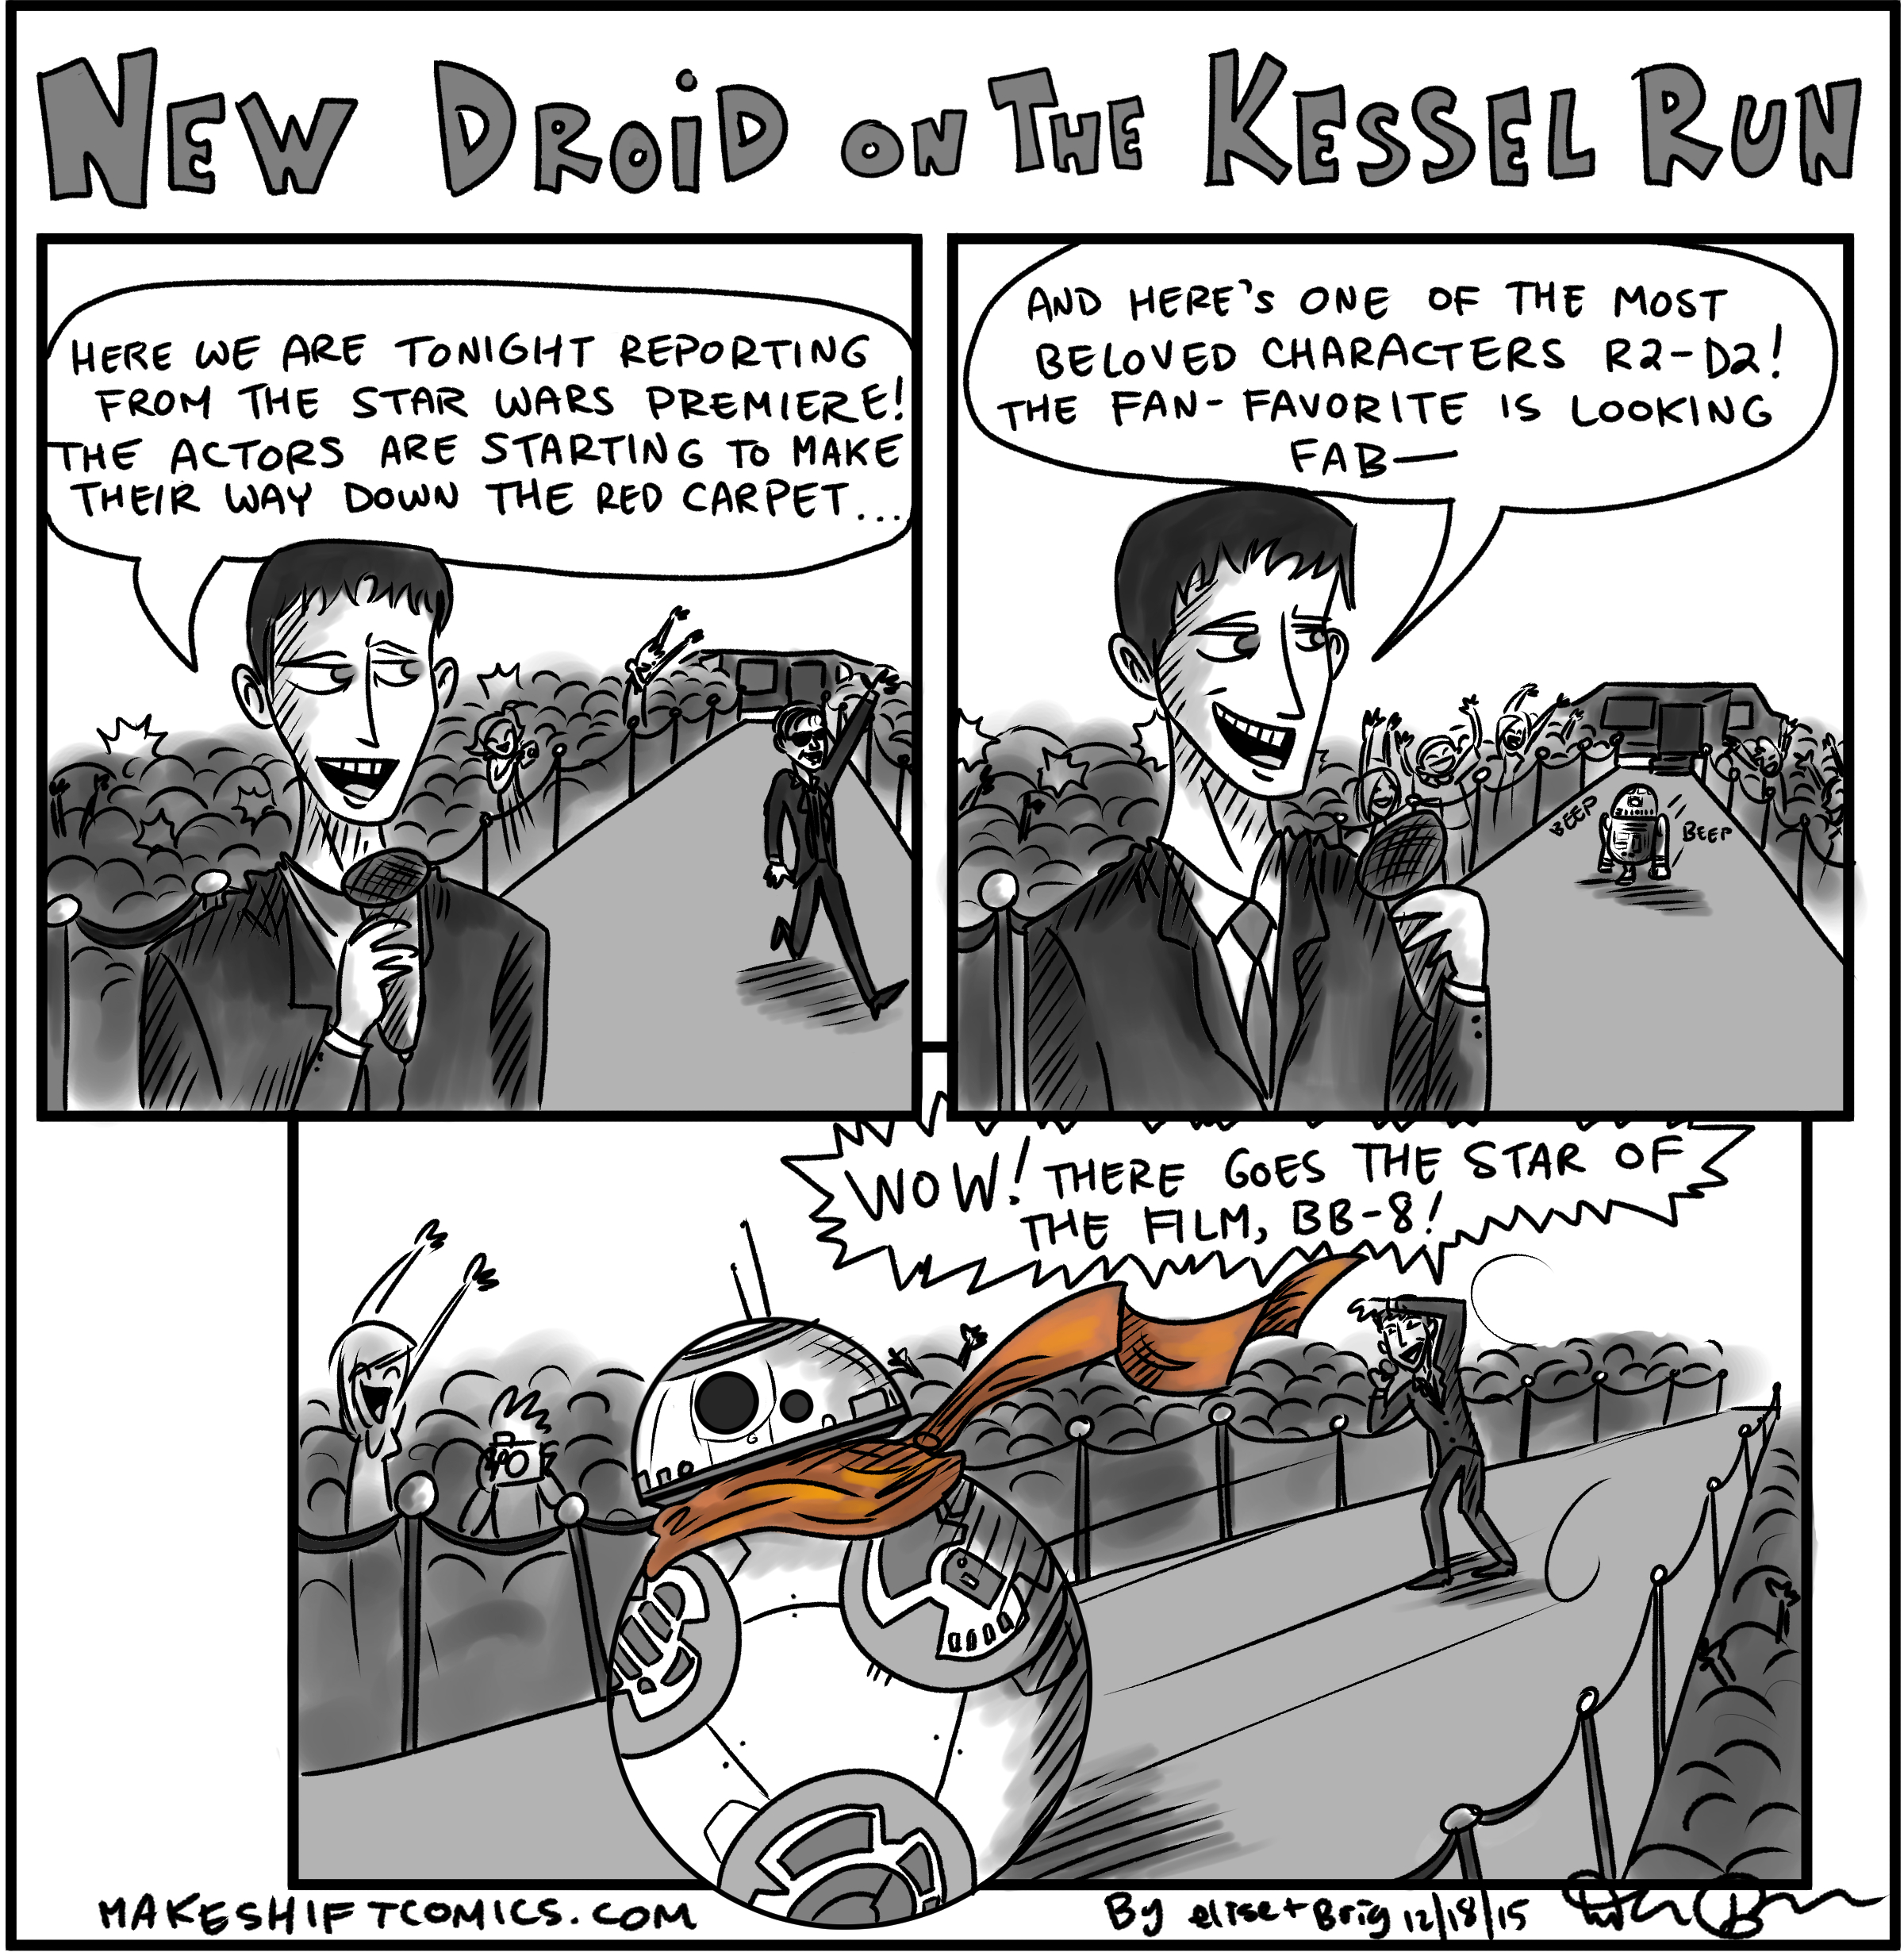 New Droid on the Kessel Run